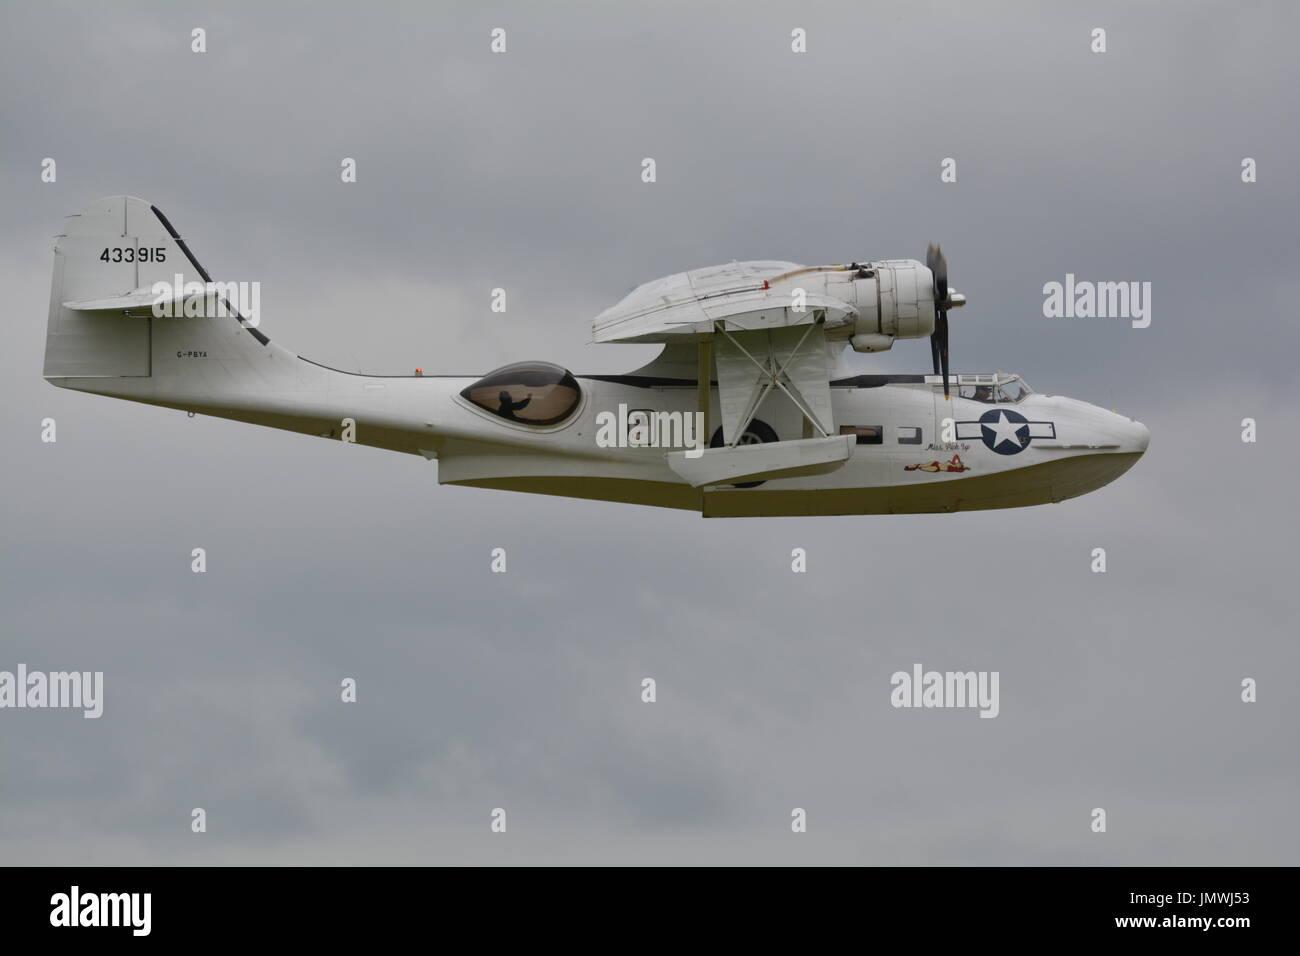 Amphibious Airplane Stock Photos & Amphibious Airplane Stock